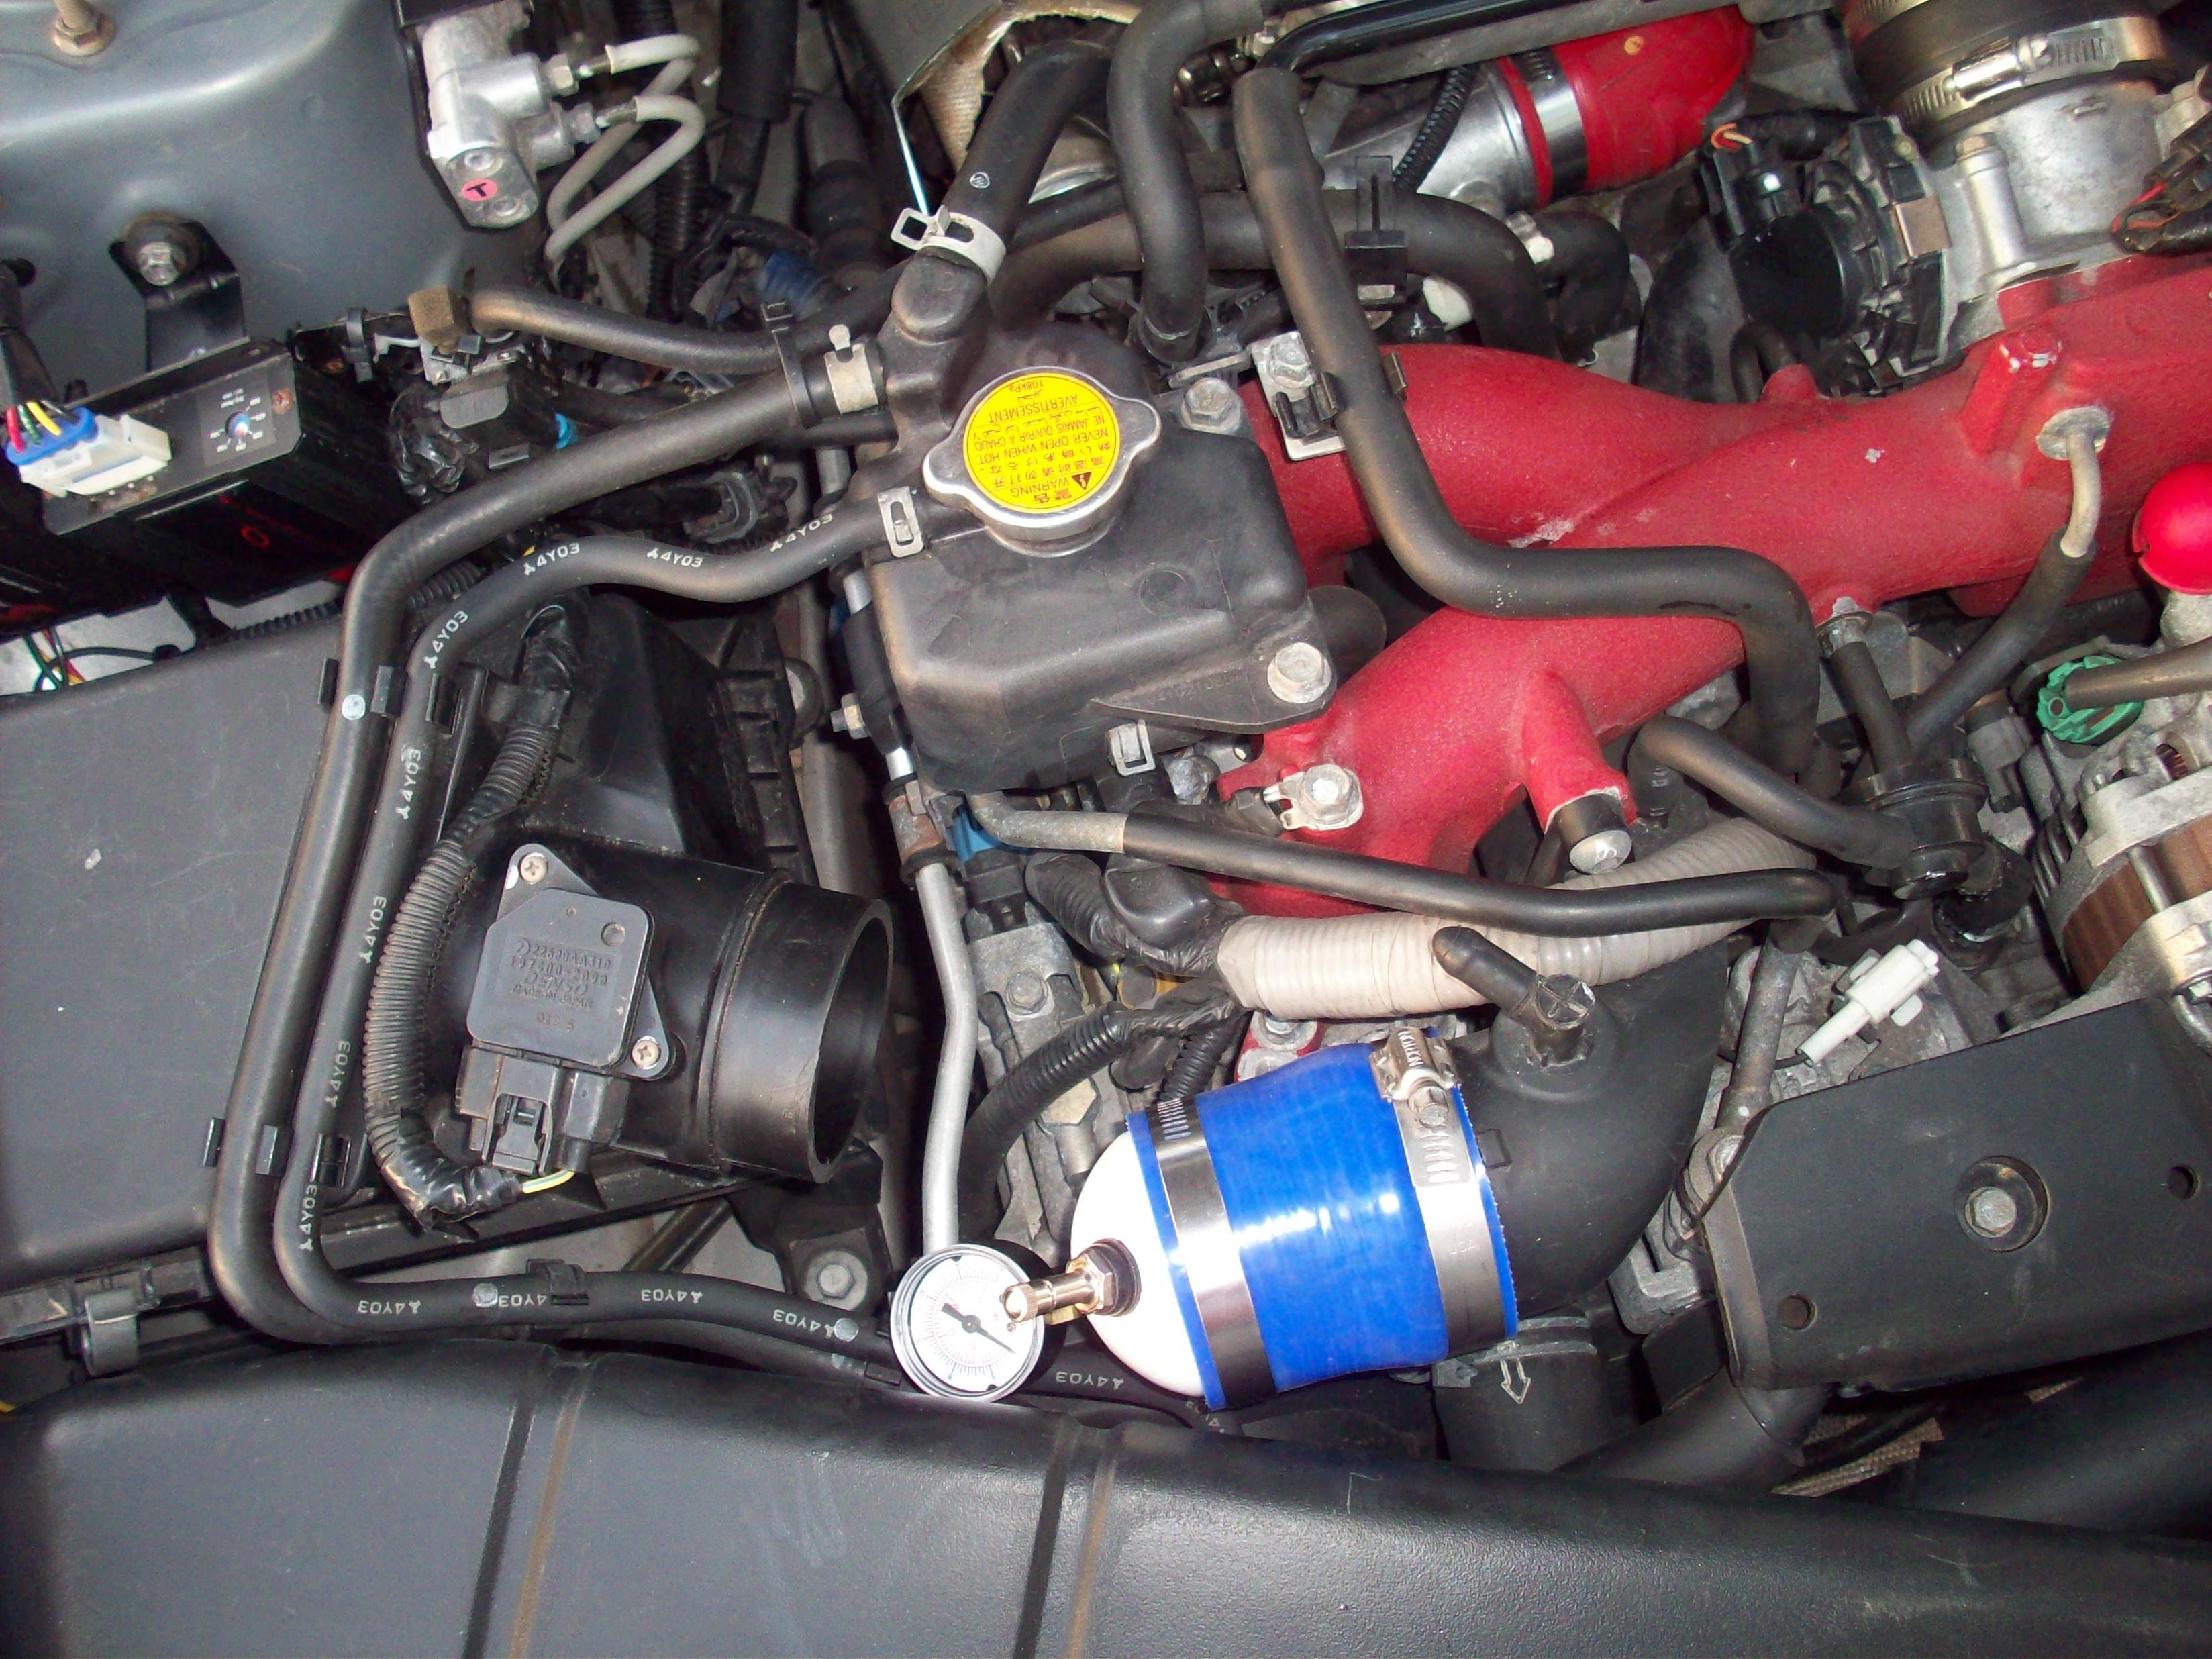 hight resolution of 1998 subaru forester engine diagram subaru forester 2005 engine coolant 2000 subaru forester engine diagram 2004